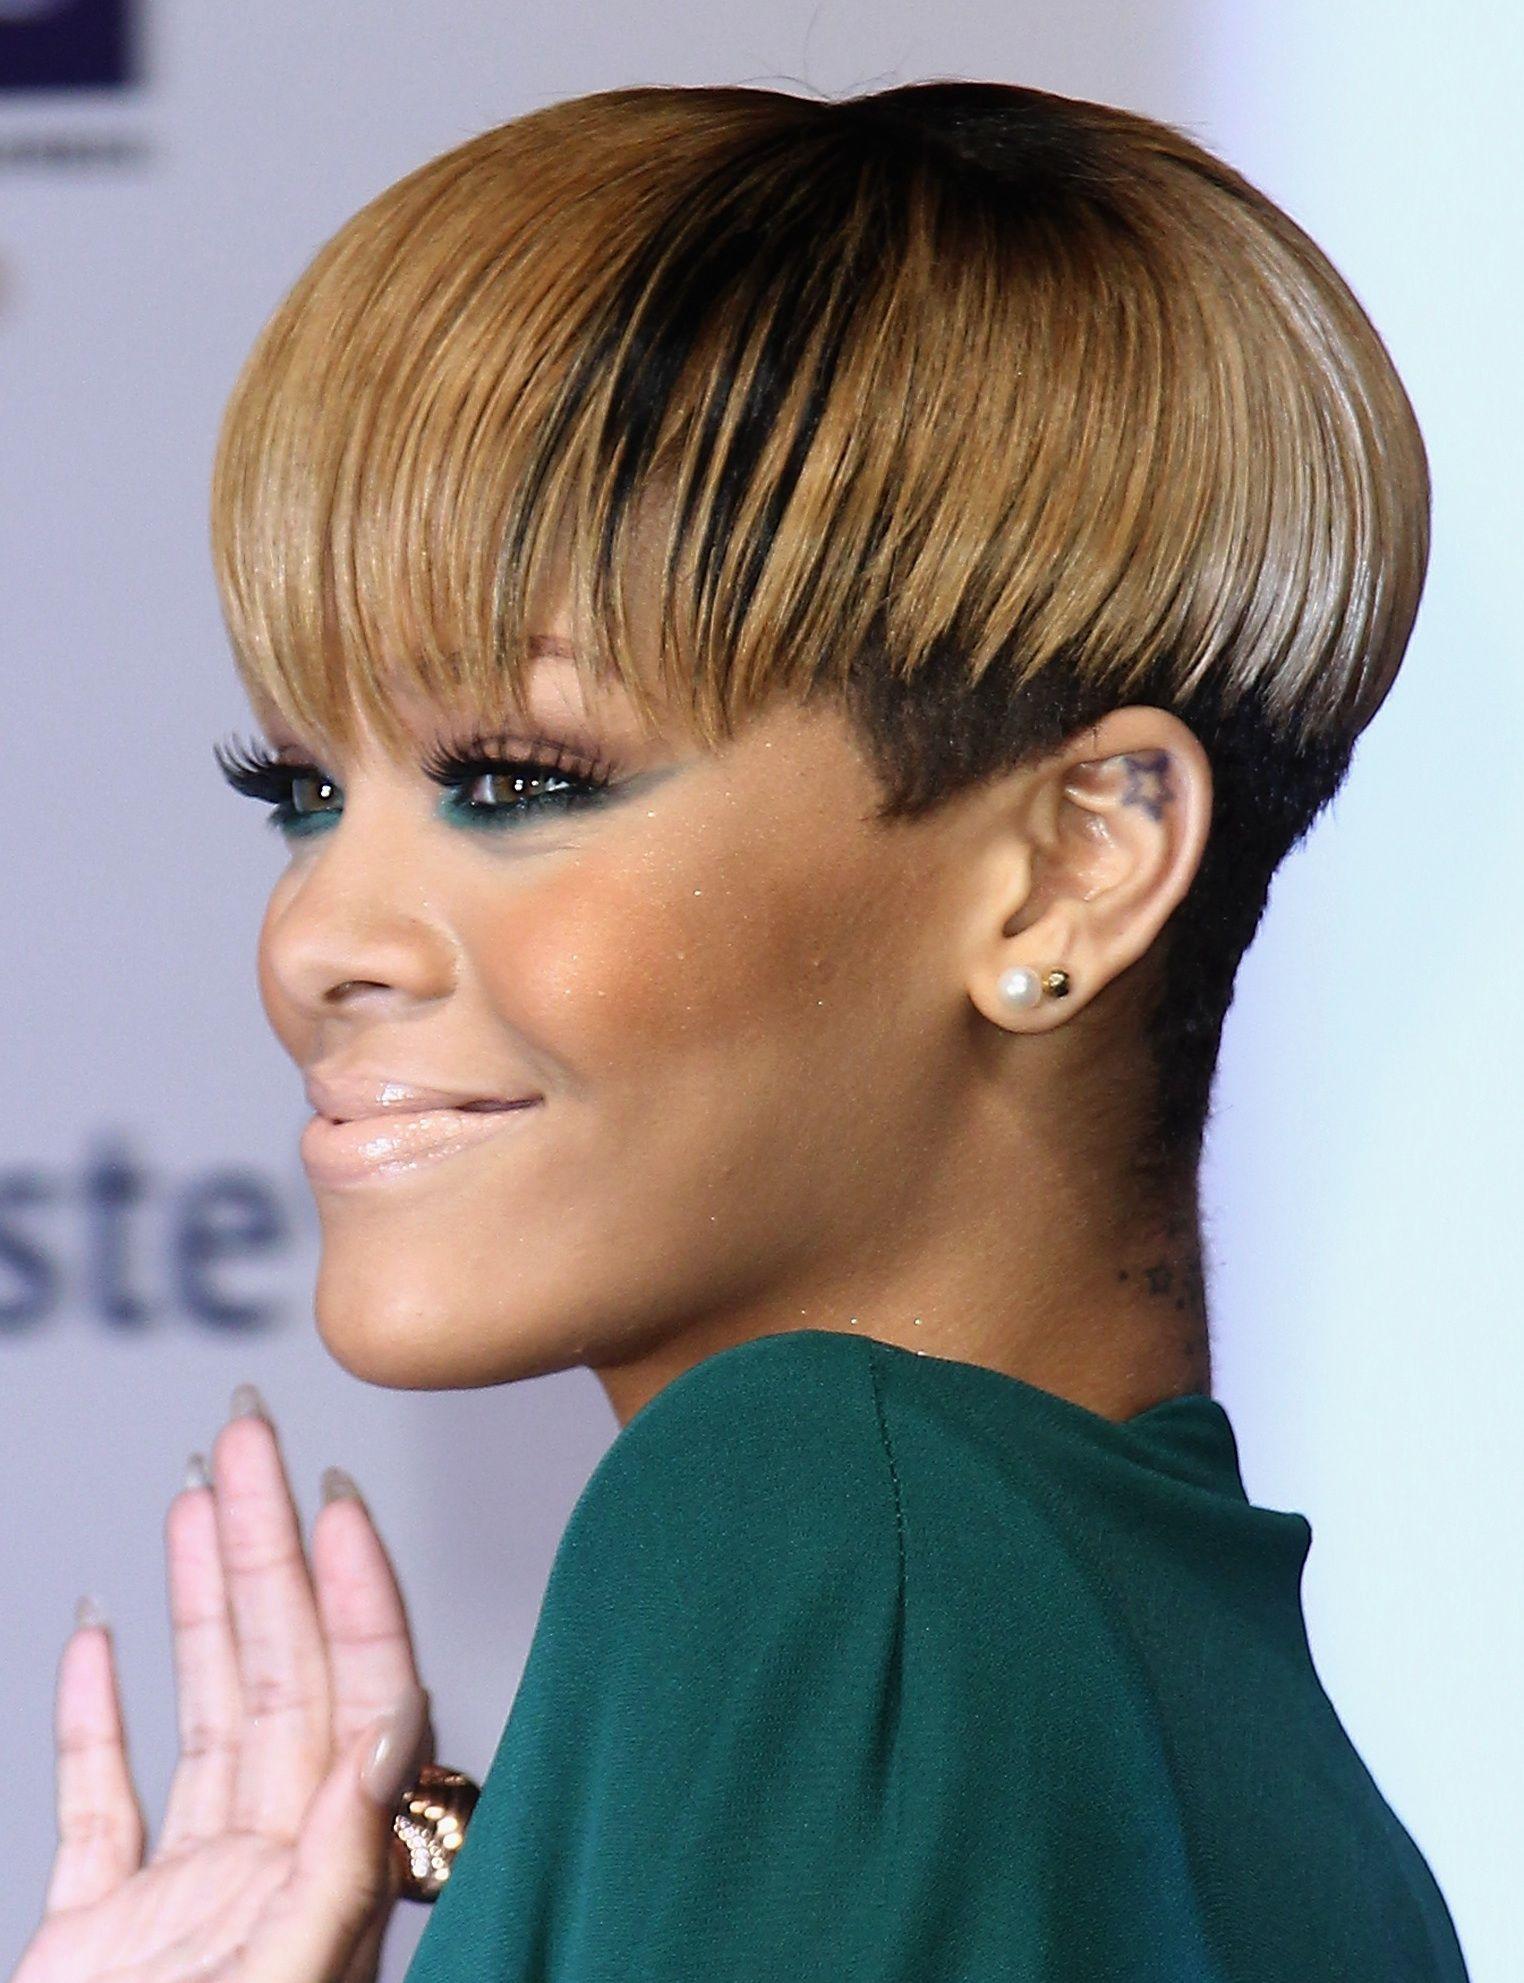 Groovy 1000 Images About Hair On Pinterest For Women Short Hairstyles Short Hairstyles For Black Women Fulllsitofus